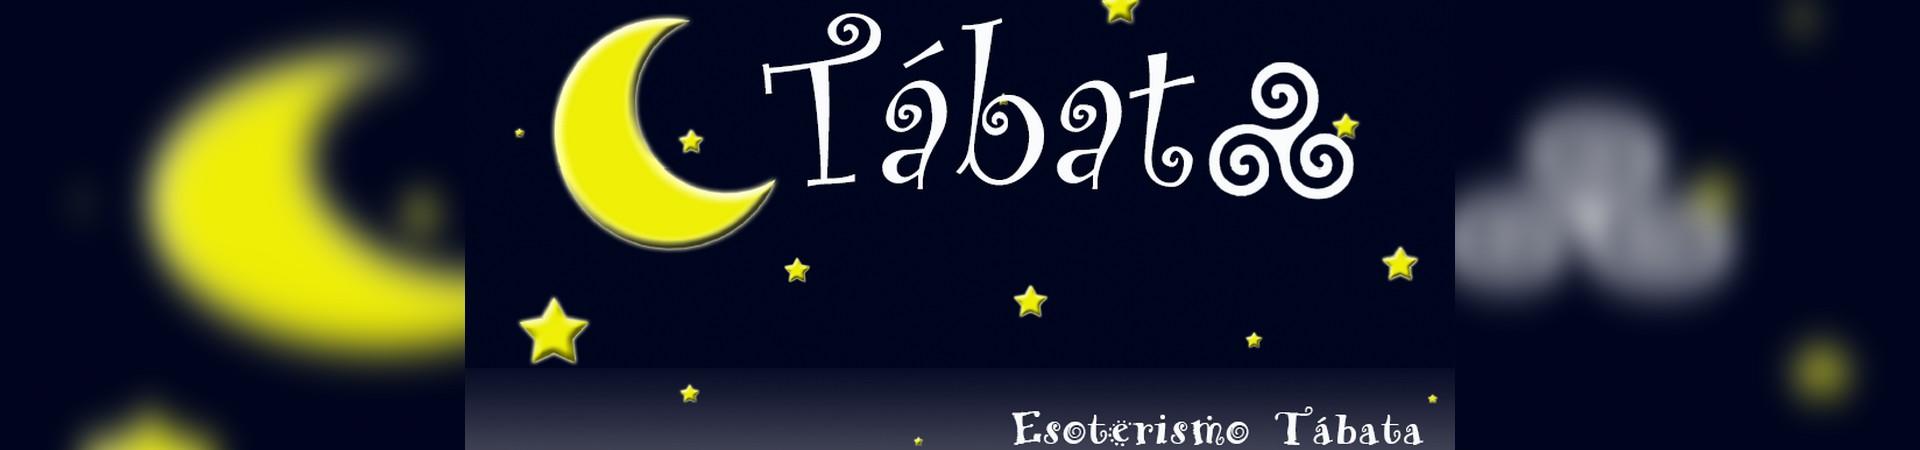 tarot en alcobendas, tarot en san sebastian de los reyes